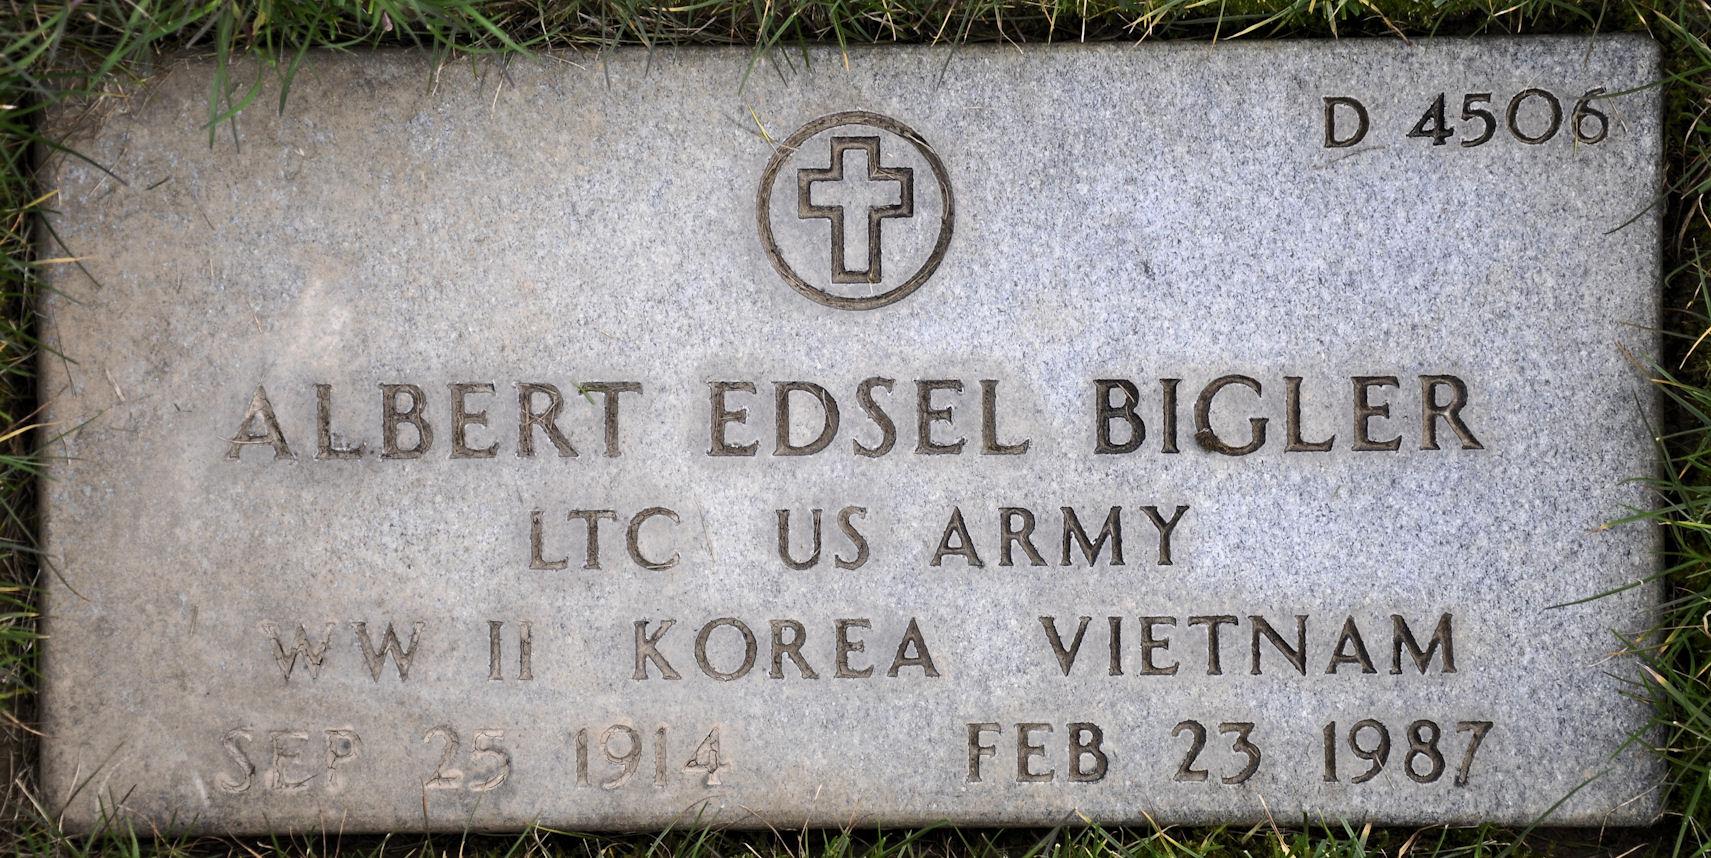 Albert Edsel Bigler